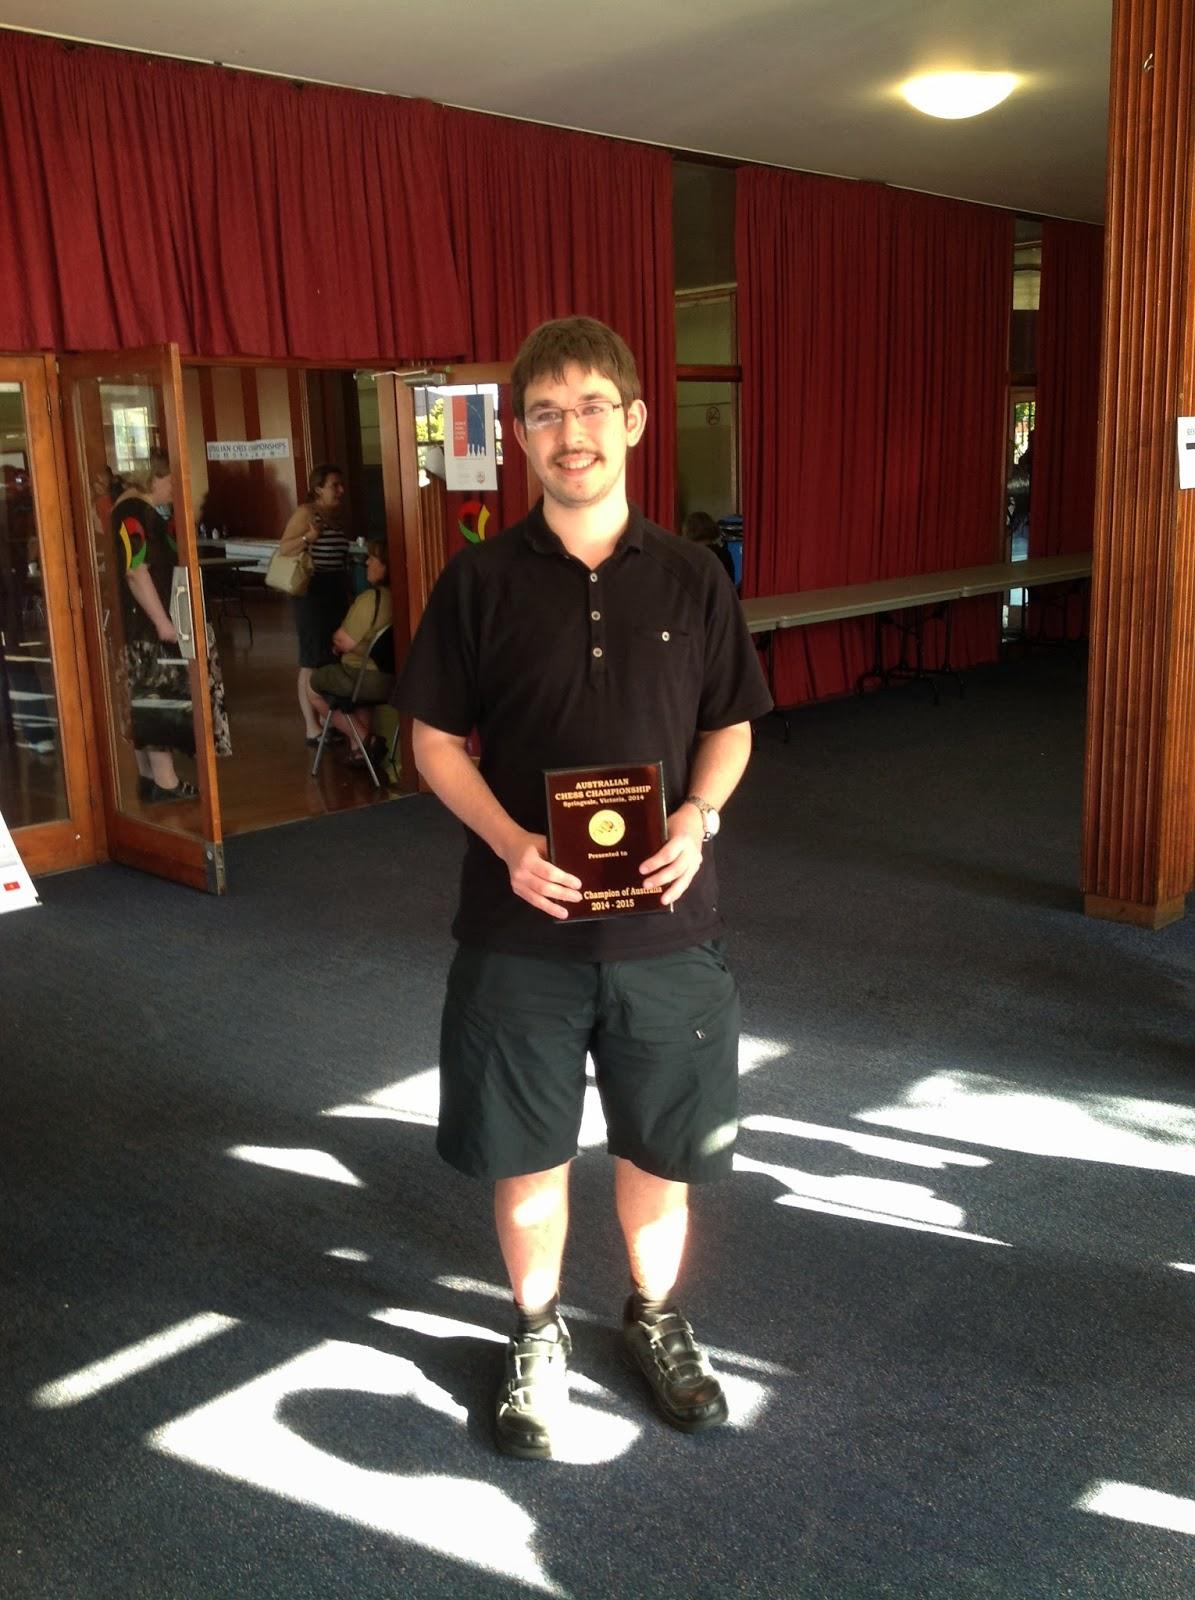 Max Illingworth wins the 2014 Australian chess championship.